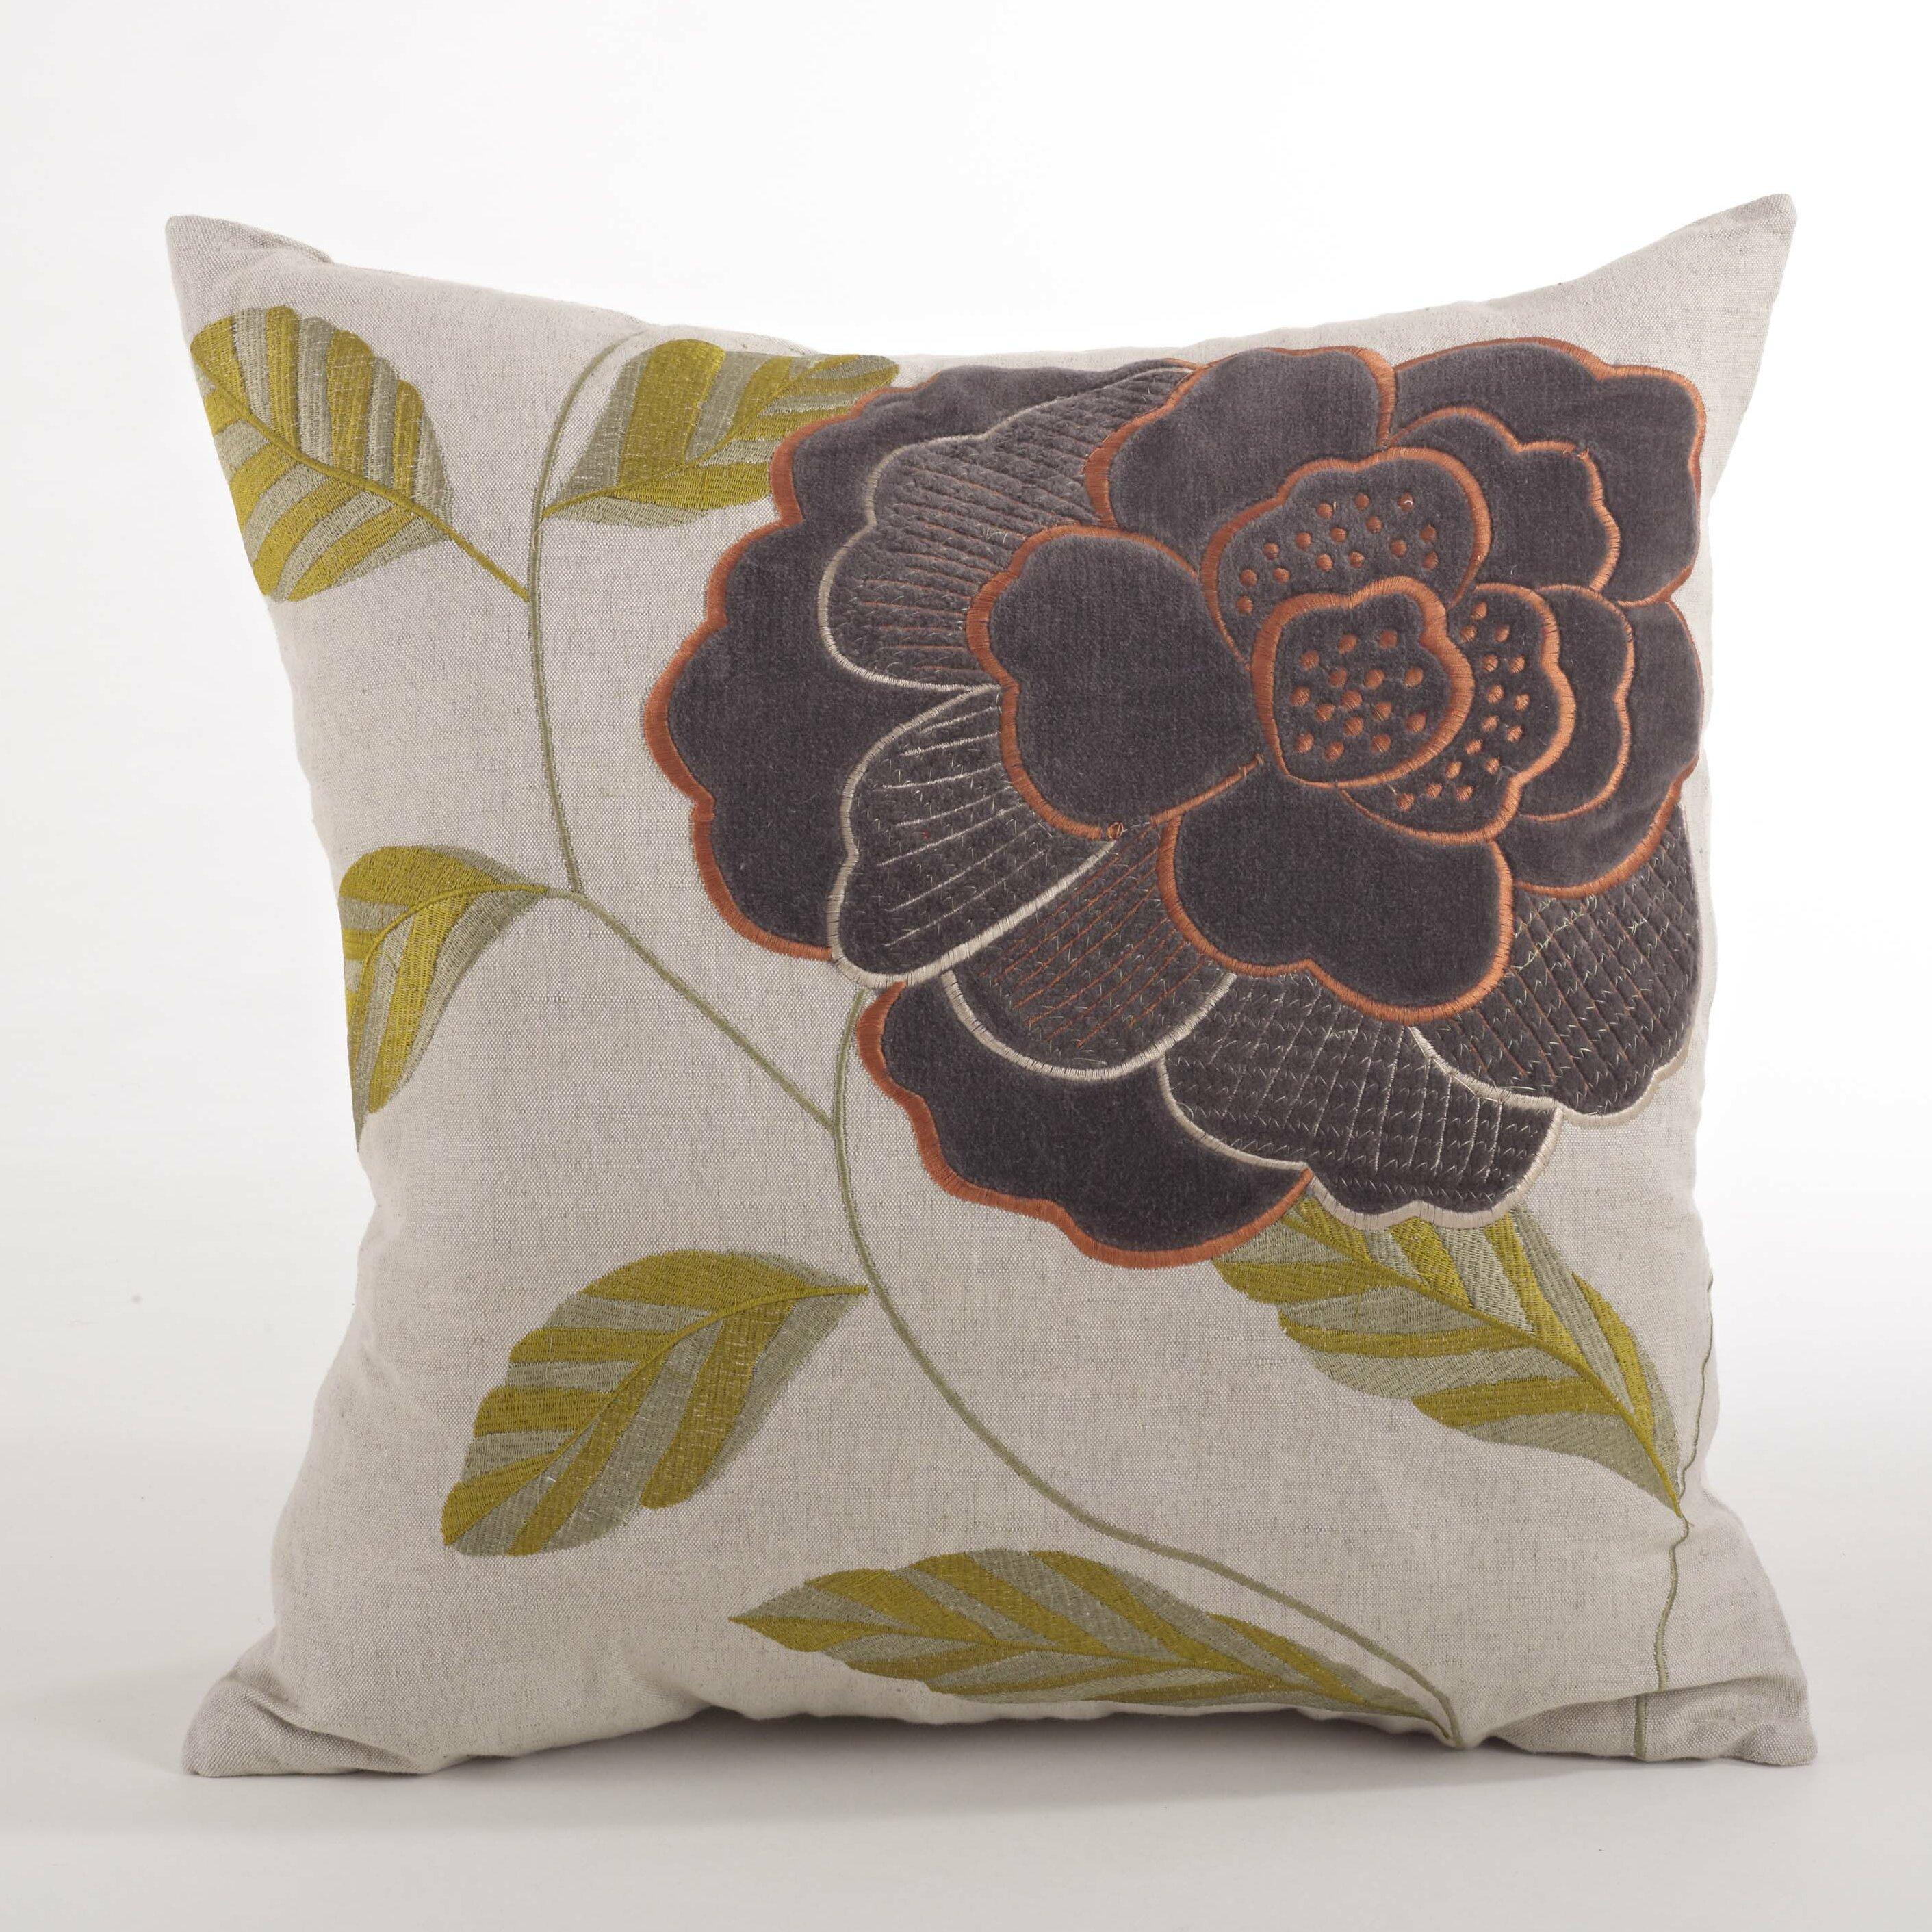 Throw Pillow Fillers : Saro Imani Embroidered Flower Design Throw Pillow Wayfair